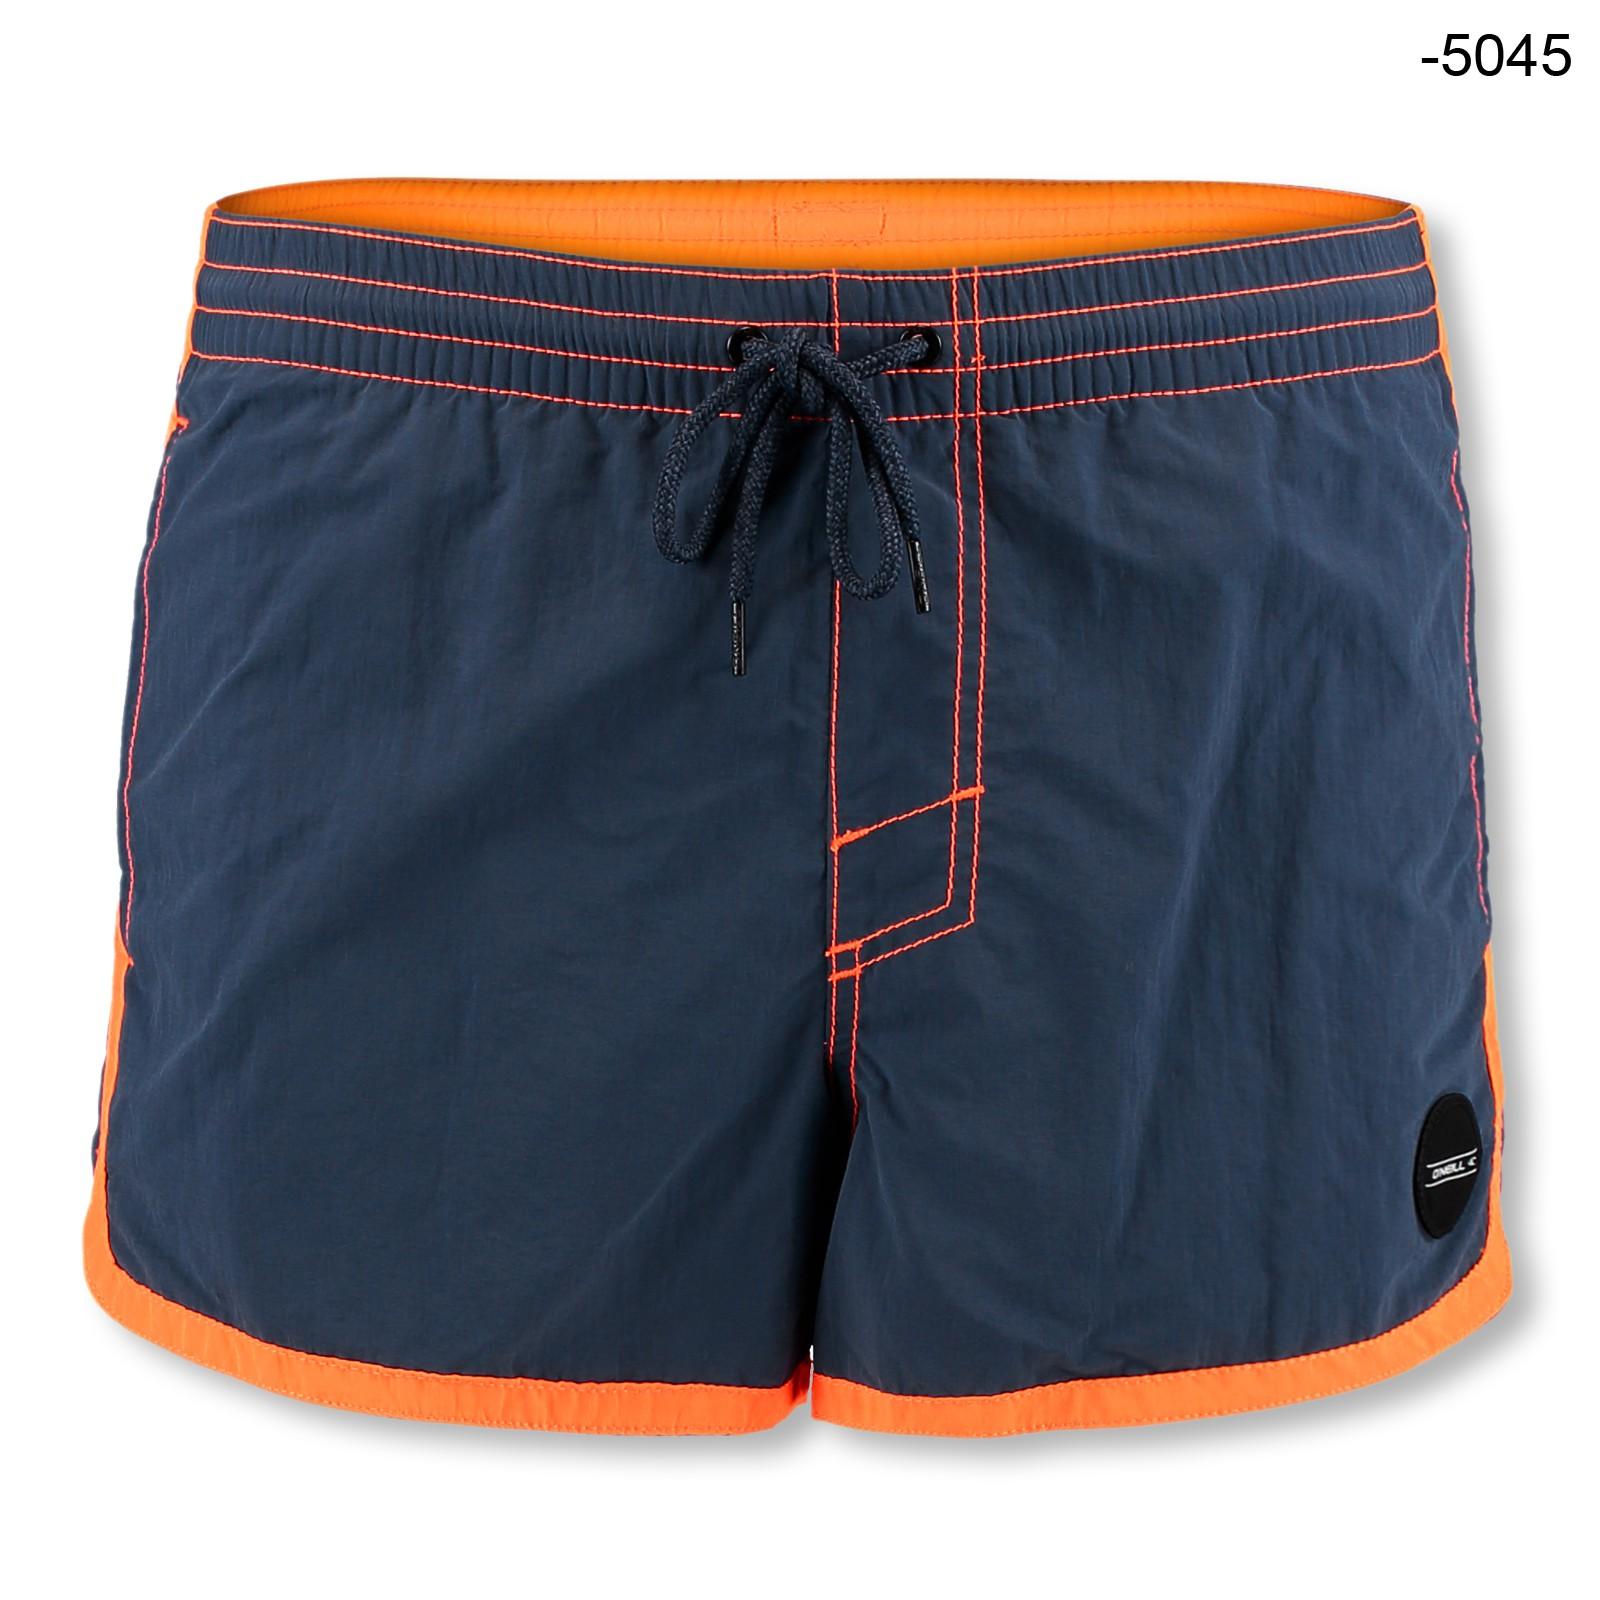 O'Neill Badeshorts Coral Shorts 7A3220 M L XL in dusty blue